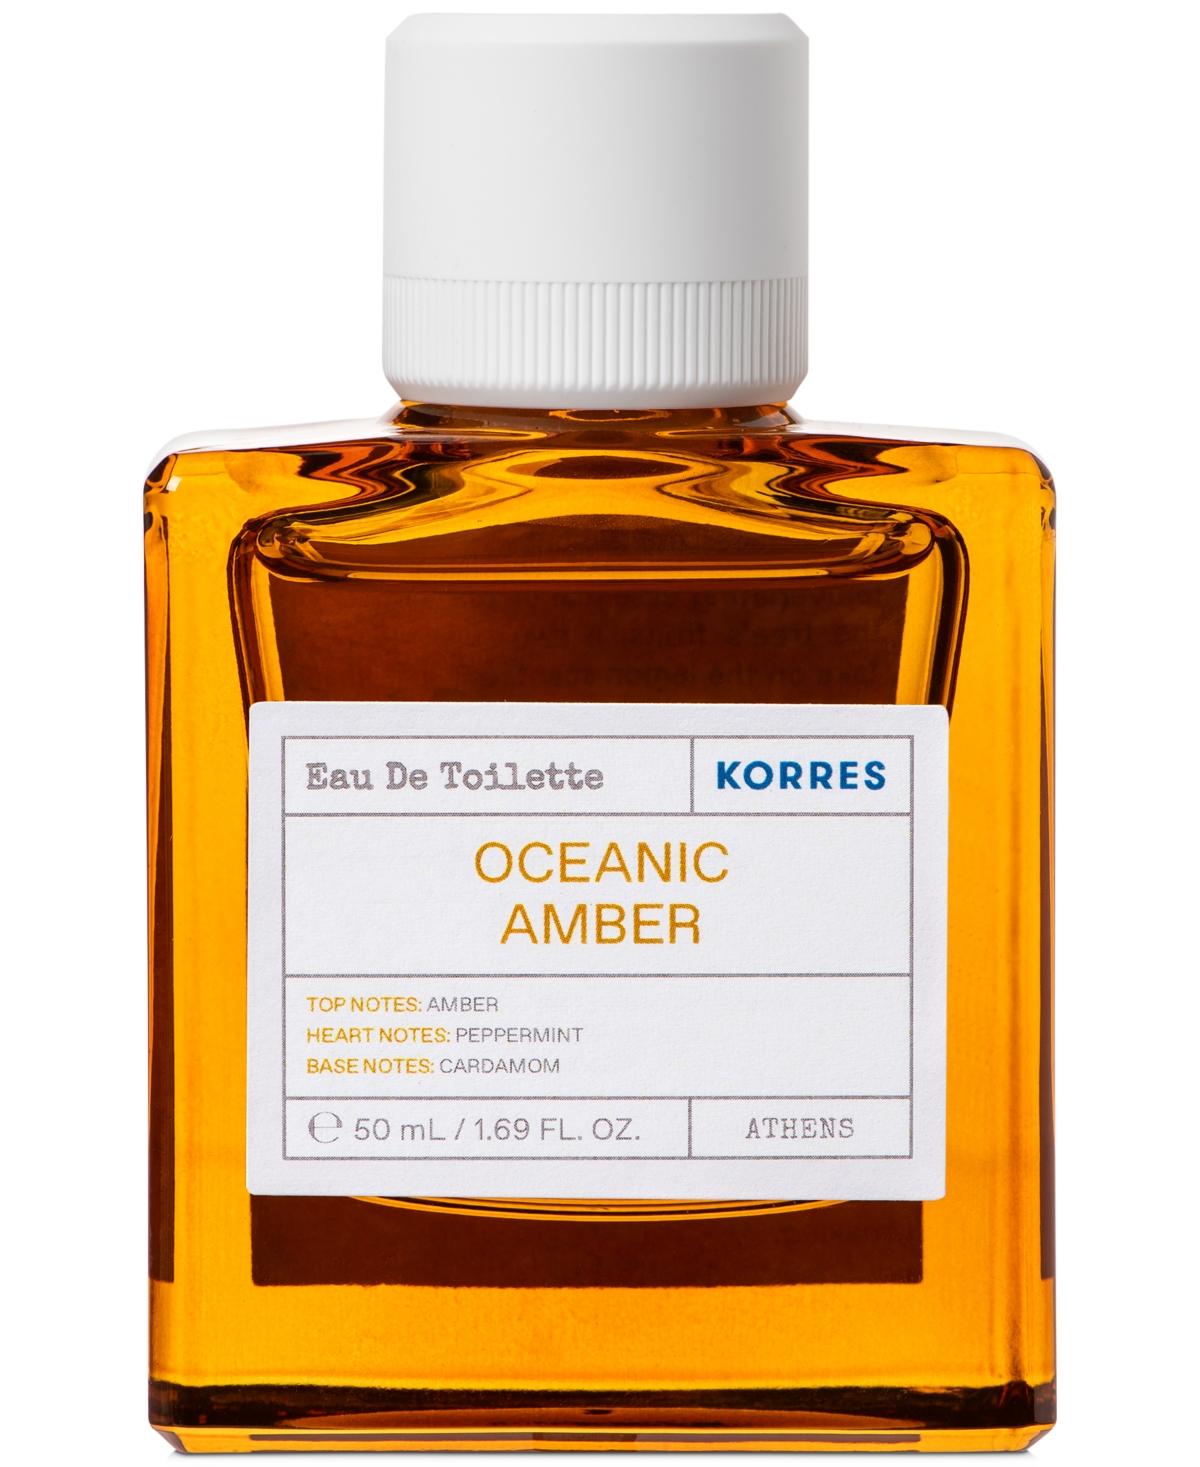 Korres Men's Oceanic Amber Eau de Toilette, 50 ml